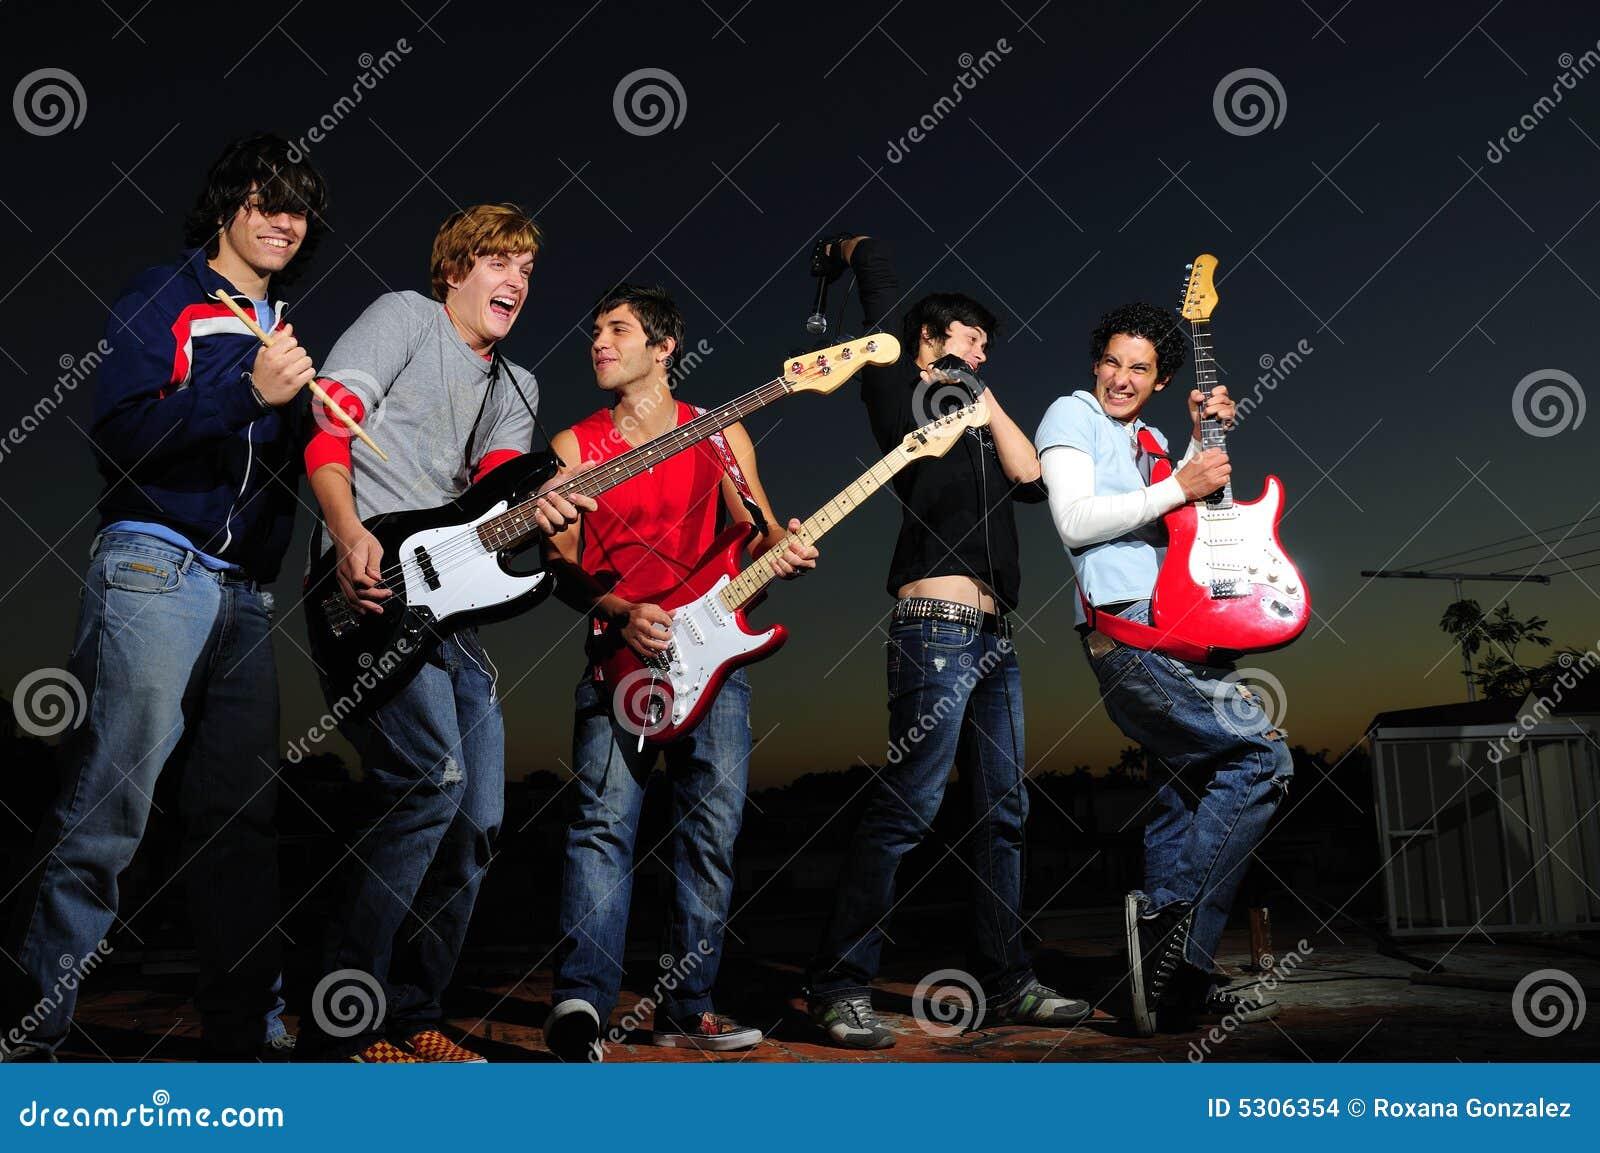 Download Banda rock teenager fotografia stock. Immagine di freddo - 5306354